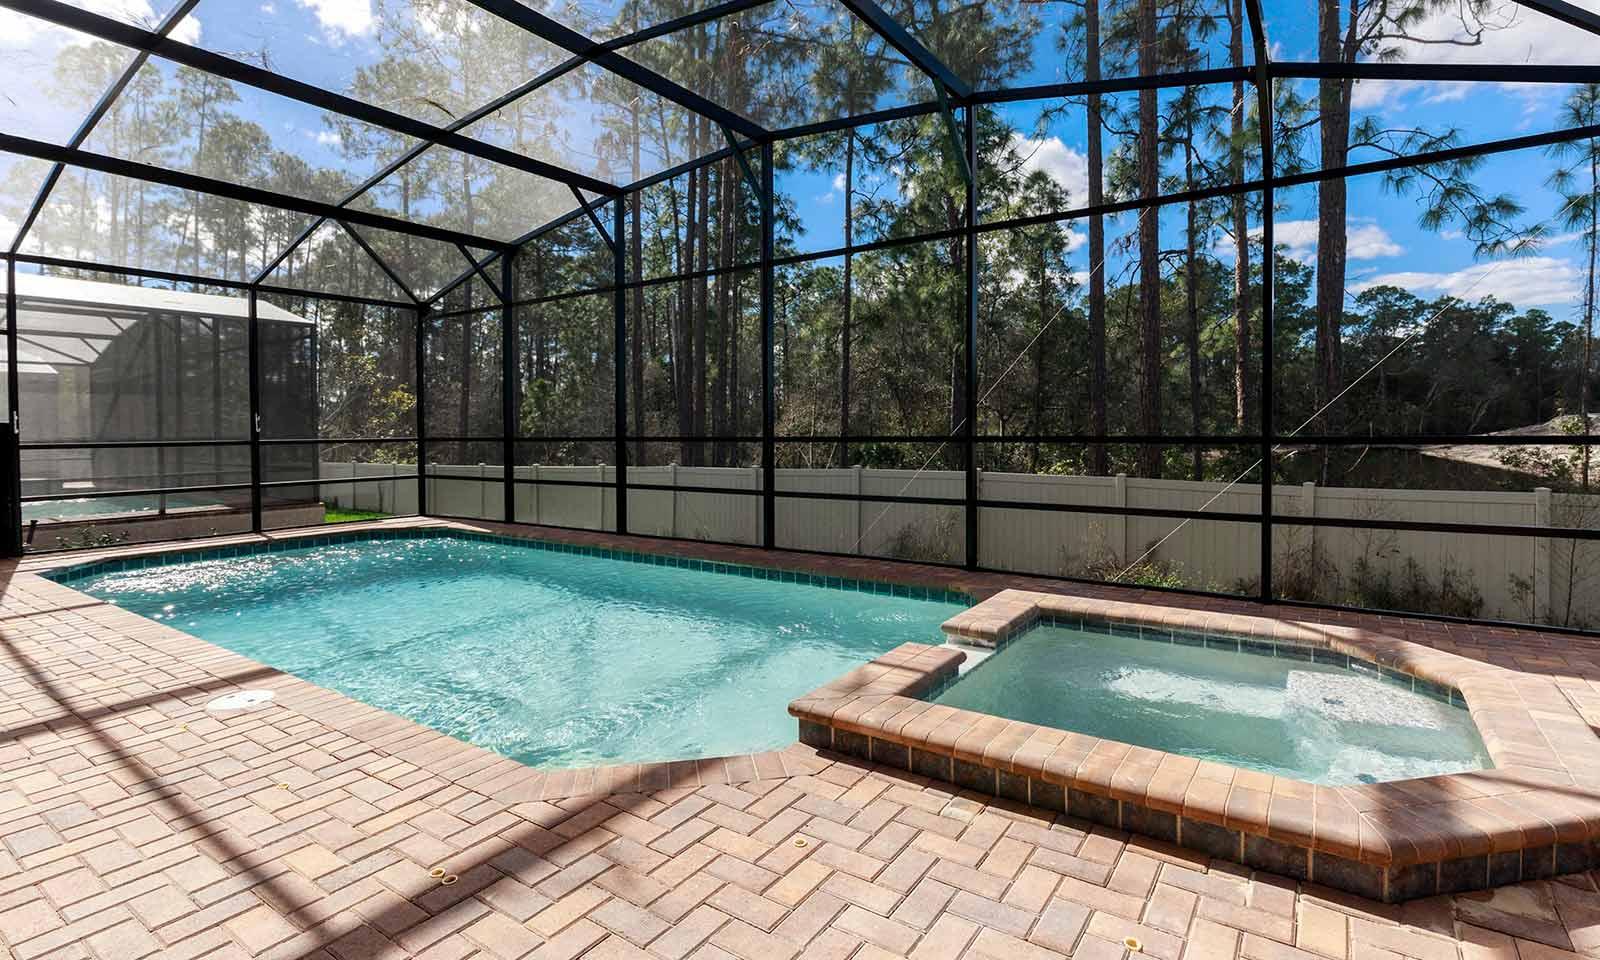 [amenities:screened-in-pool:3] Screened In Pool